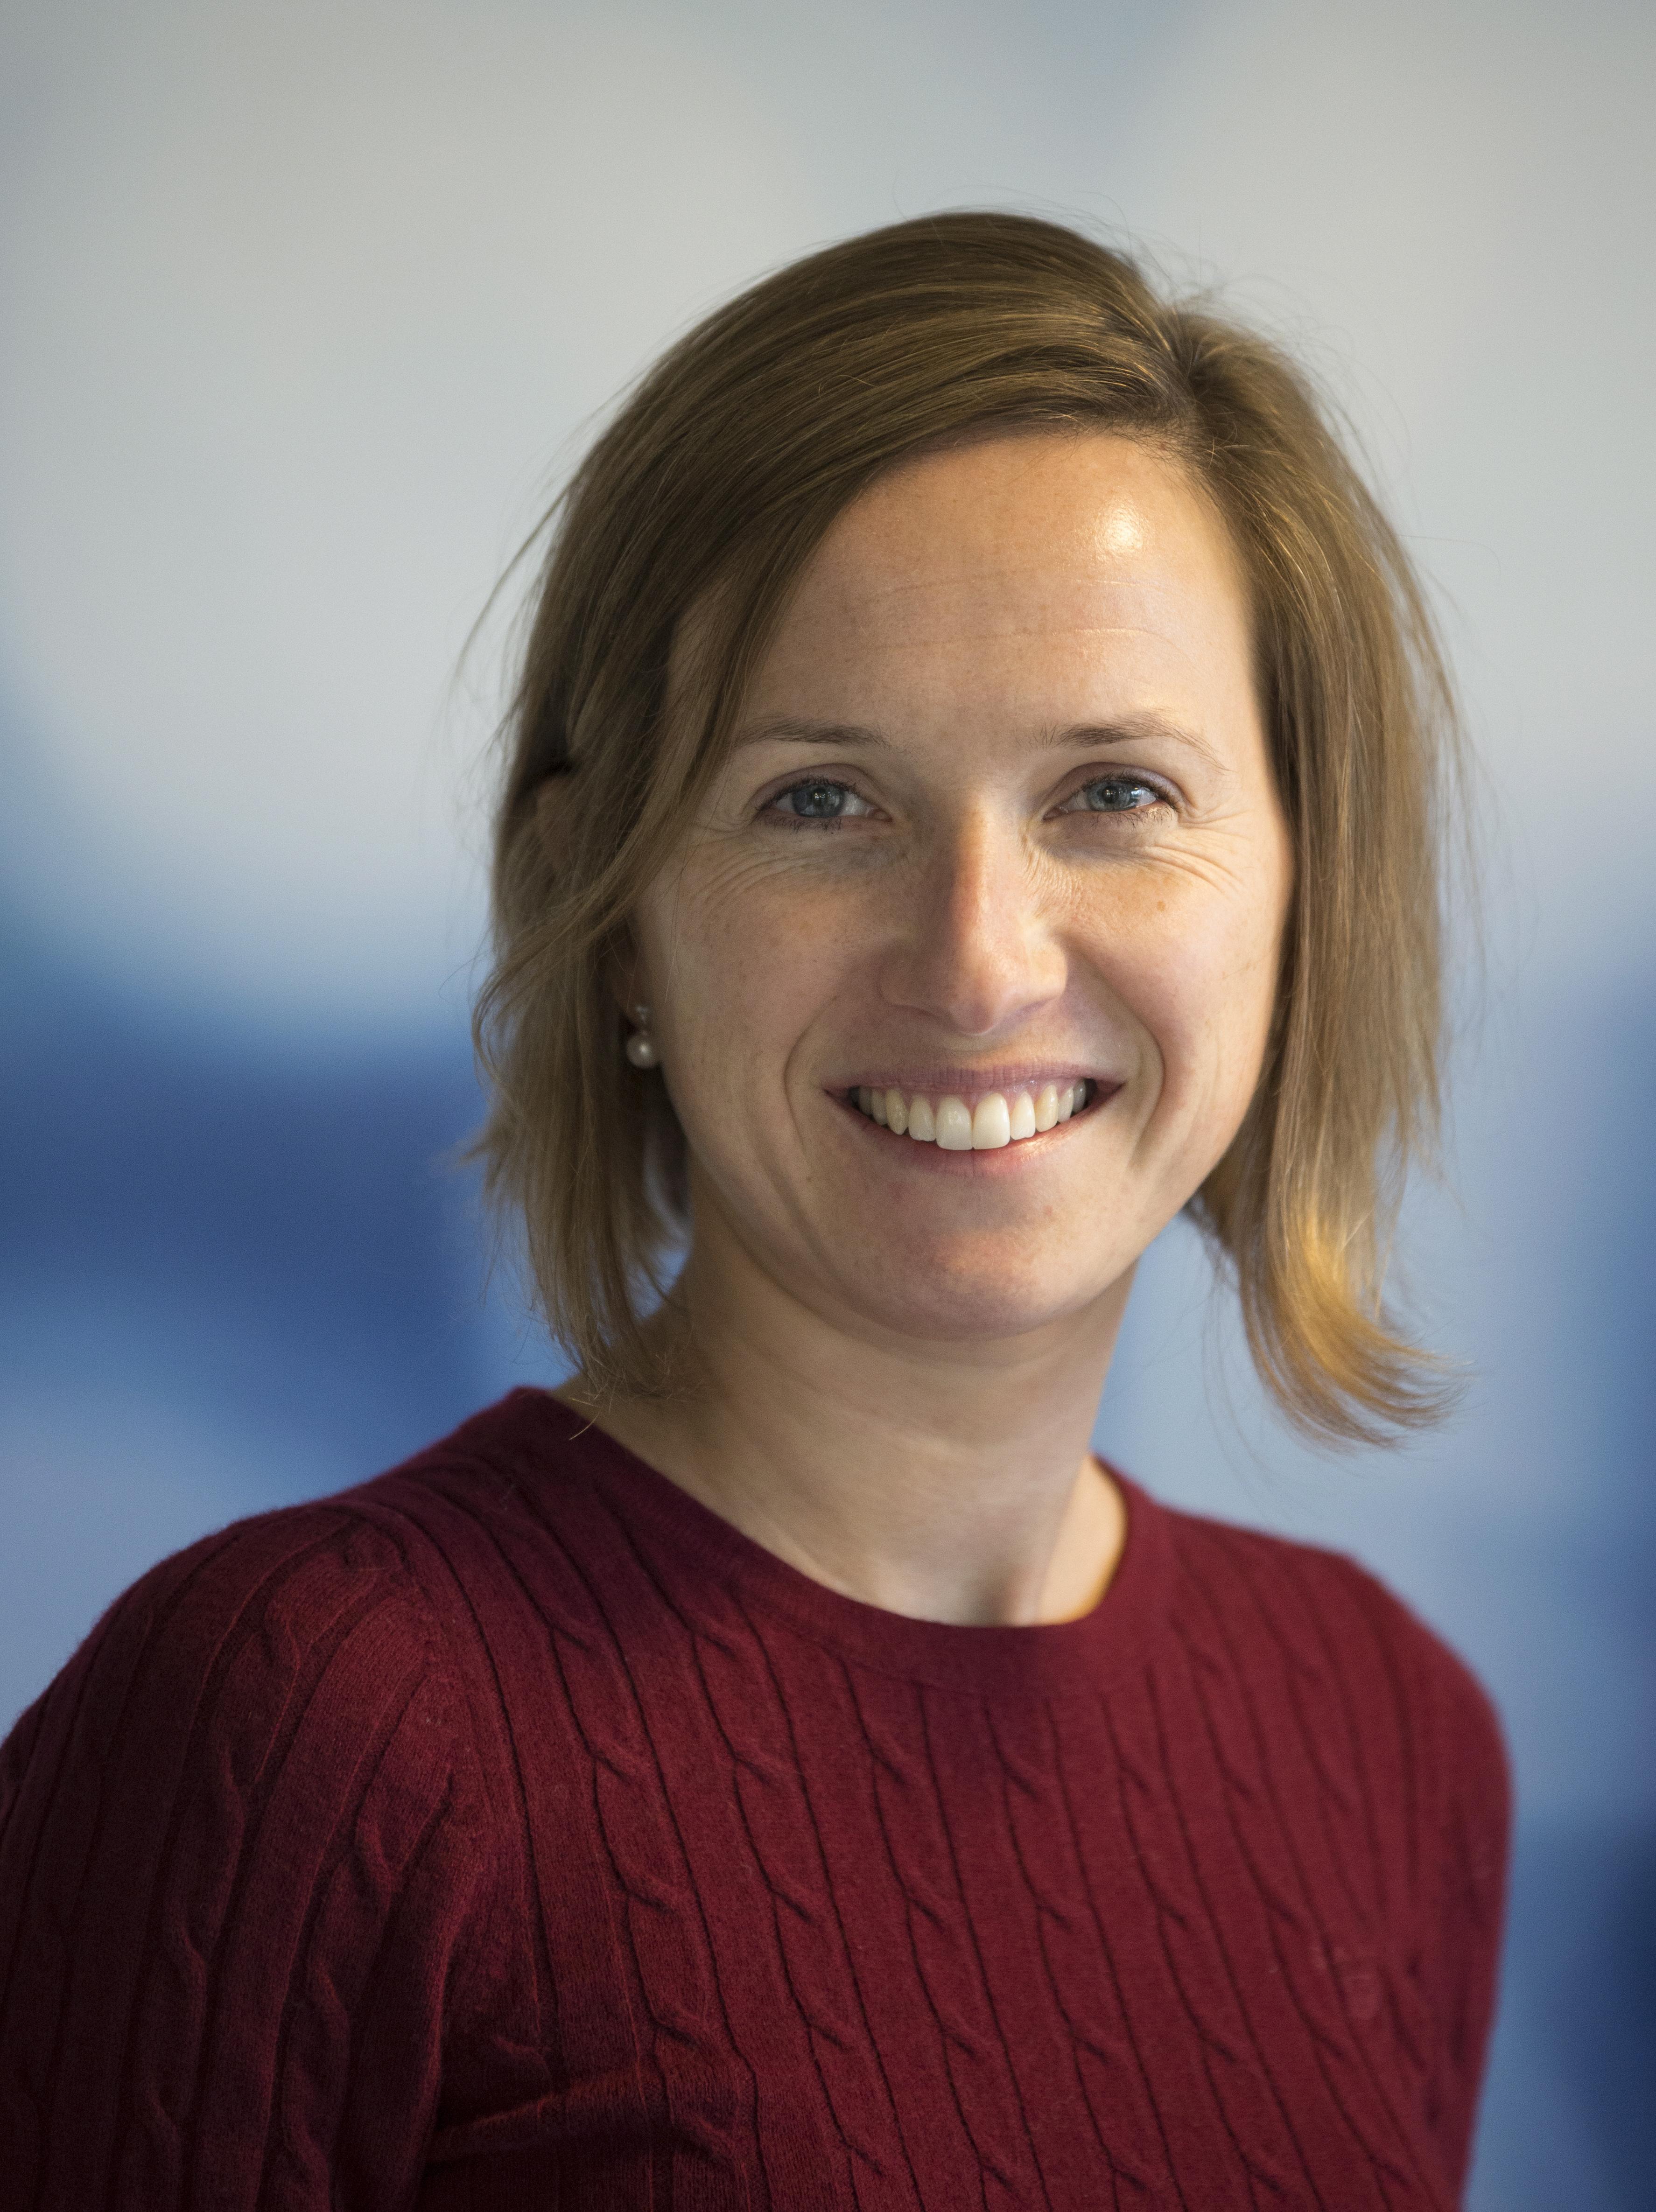 1b924ee7 Profilbilde: Marianne Knarud Stort bilde